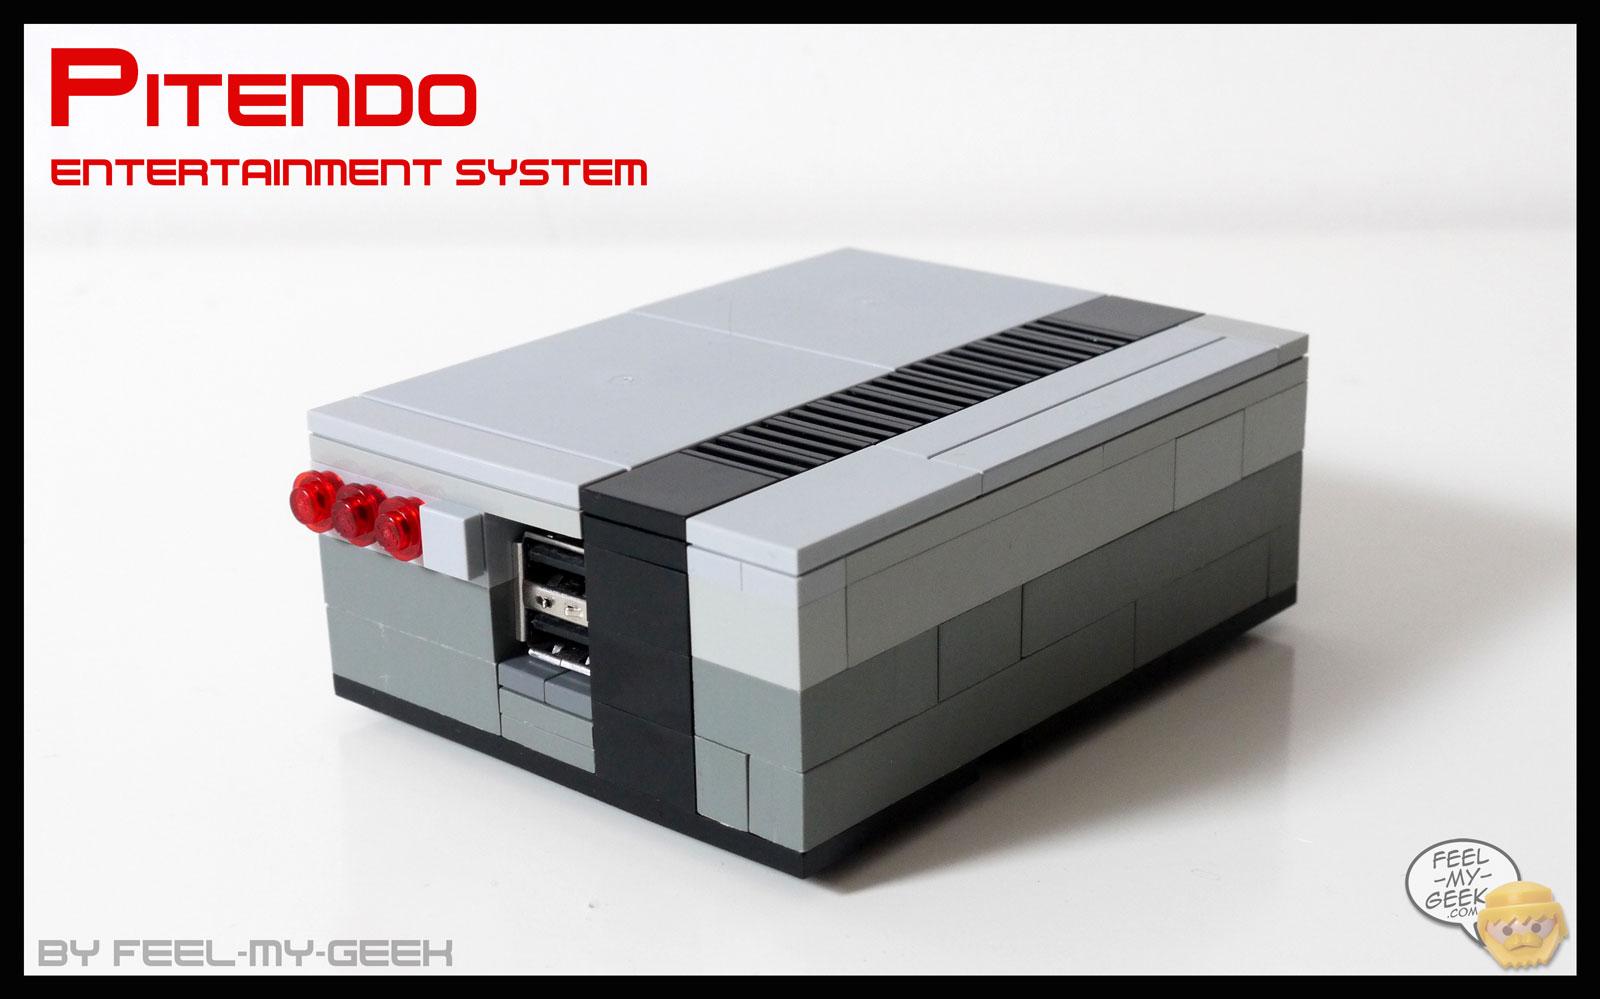 pitendo entertainment system la meilleure console retro au monde feel my. Black Bedroom Furniture Sets. Home Design Ideas